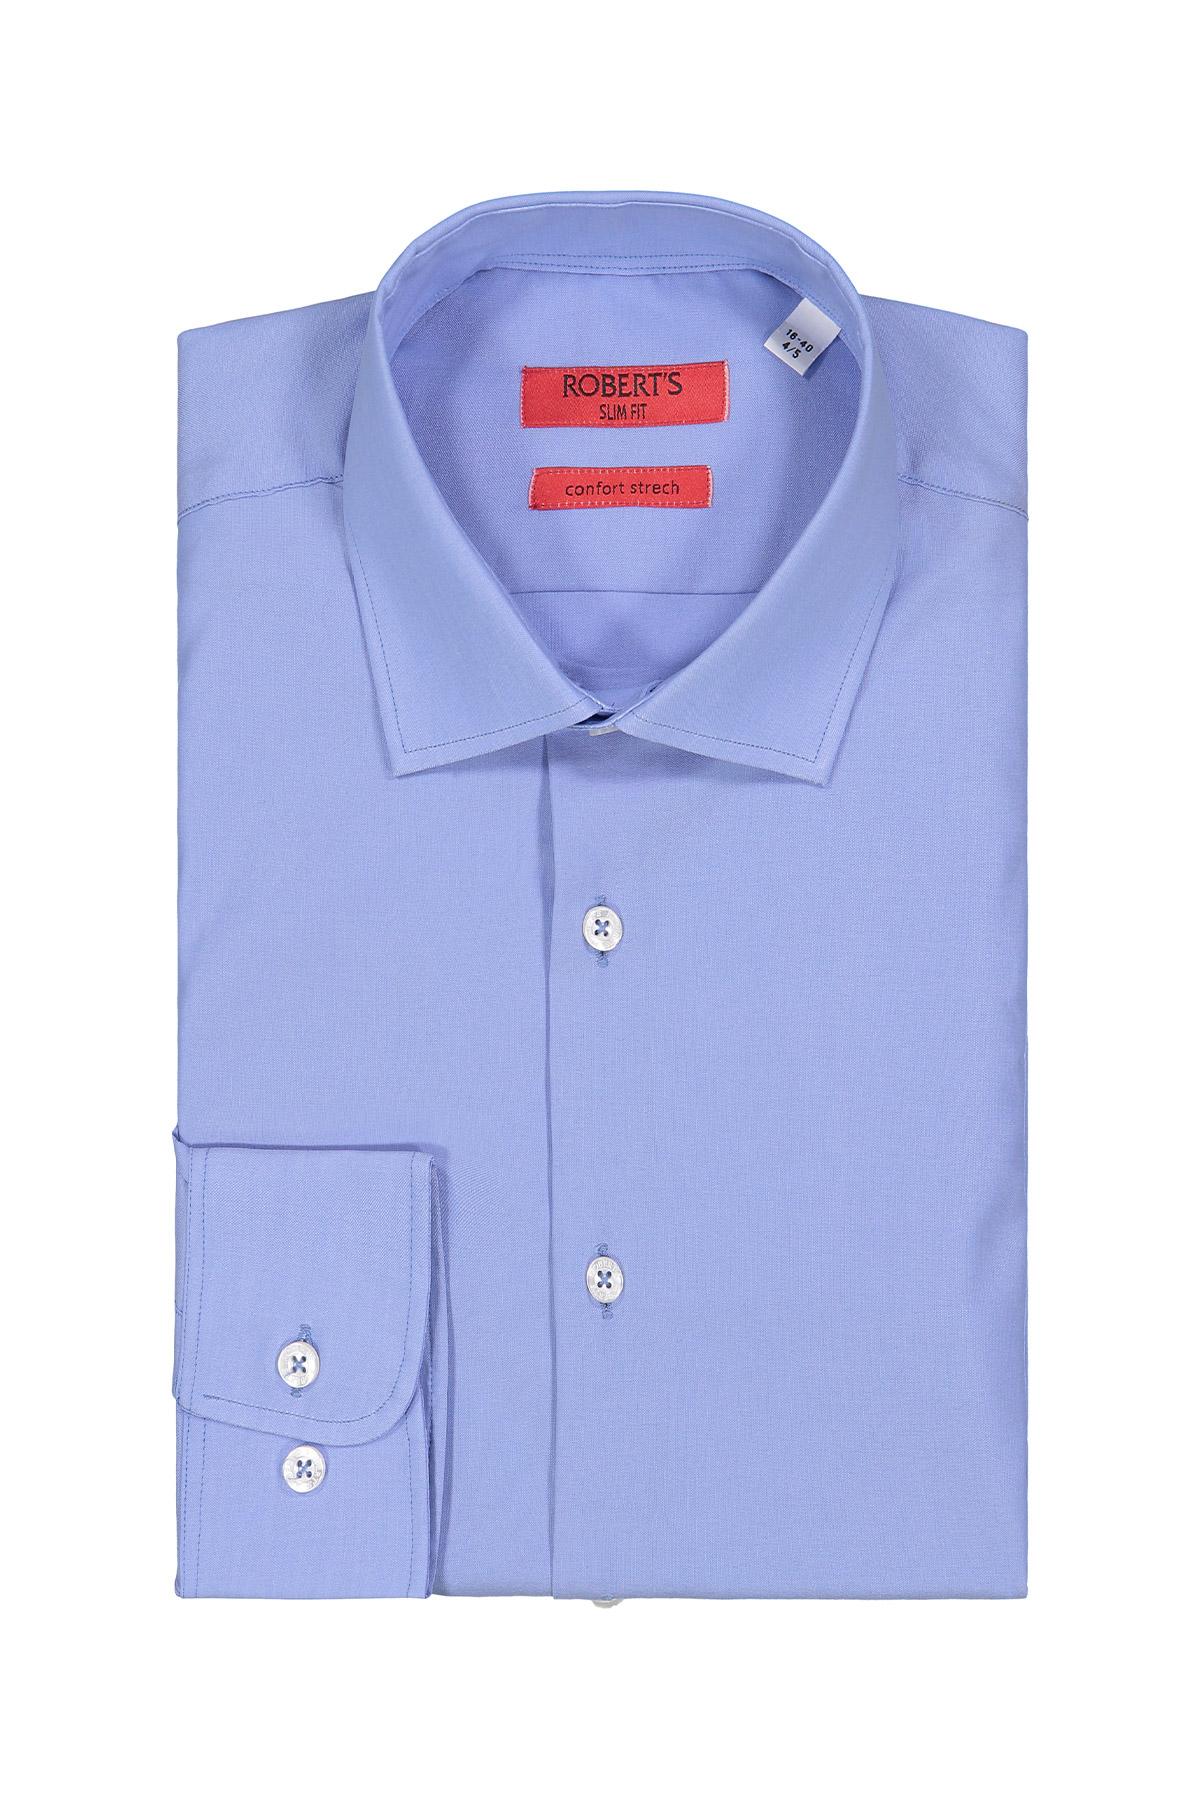 Camisa Robert´s, poplin celeste liso, cuello italiano, puño simple.